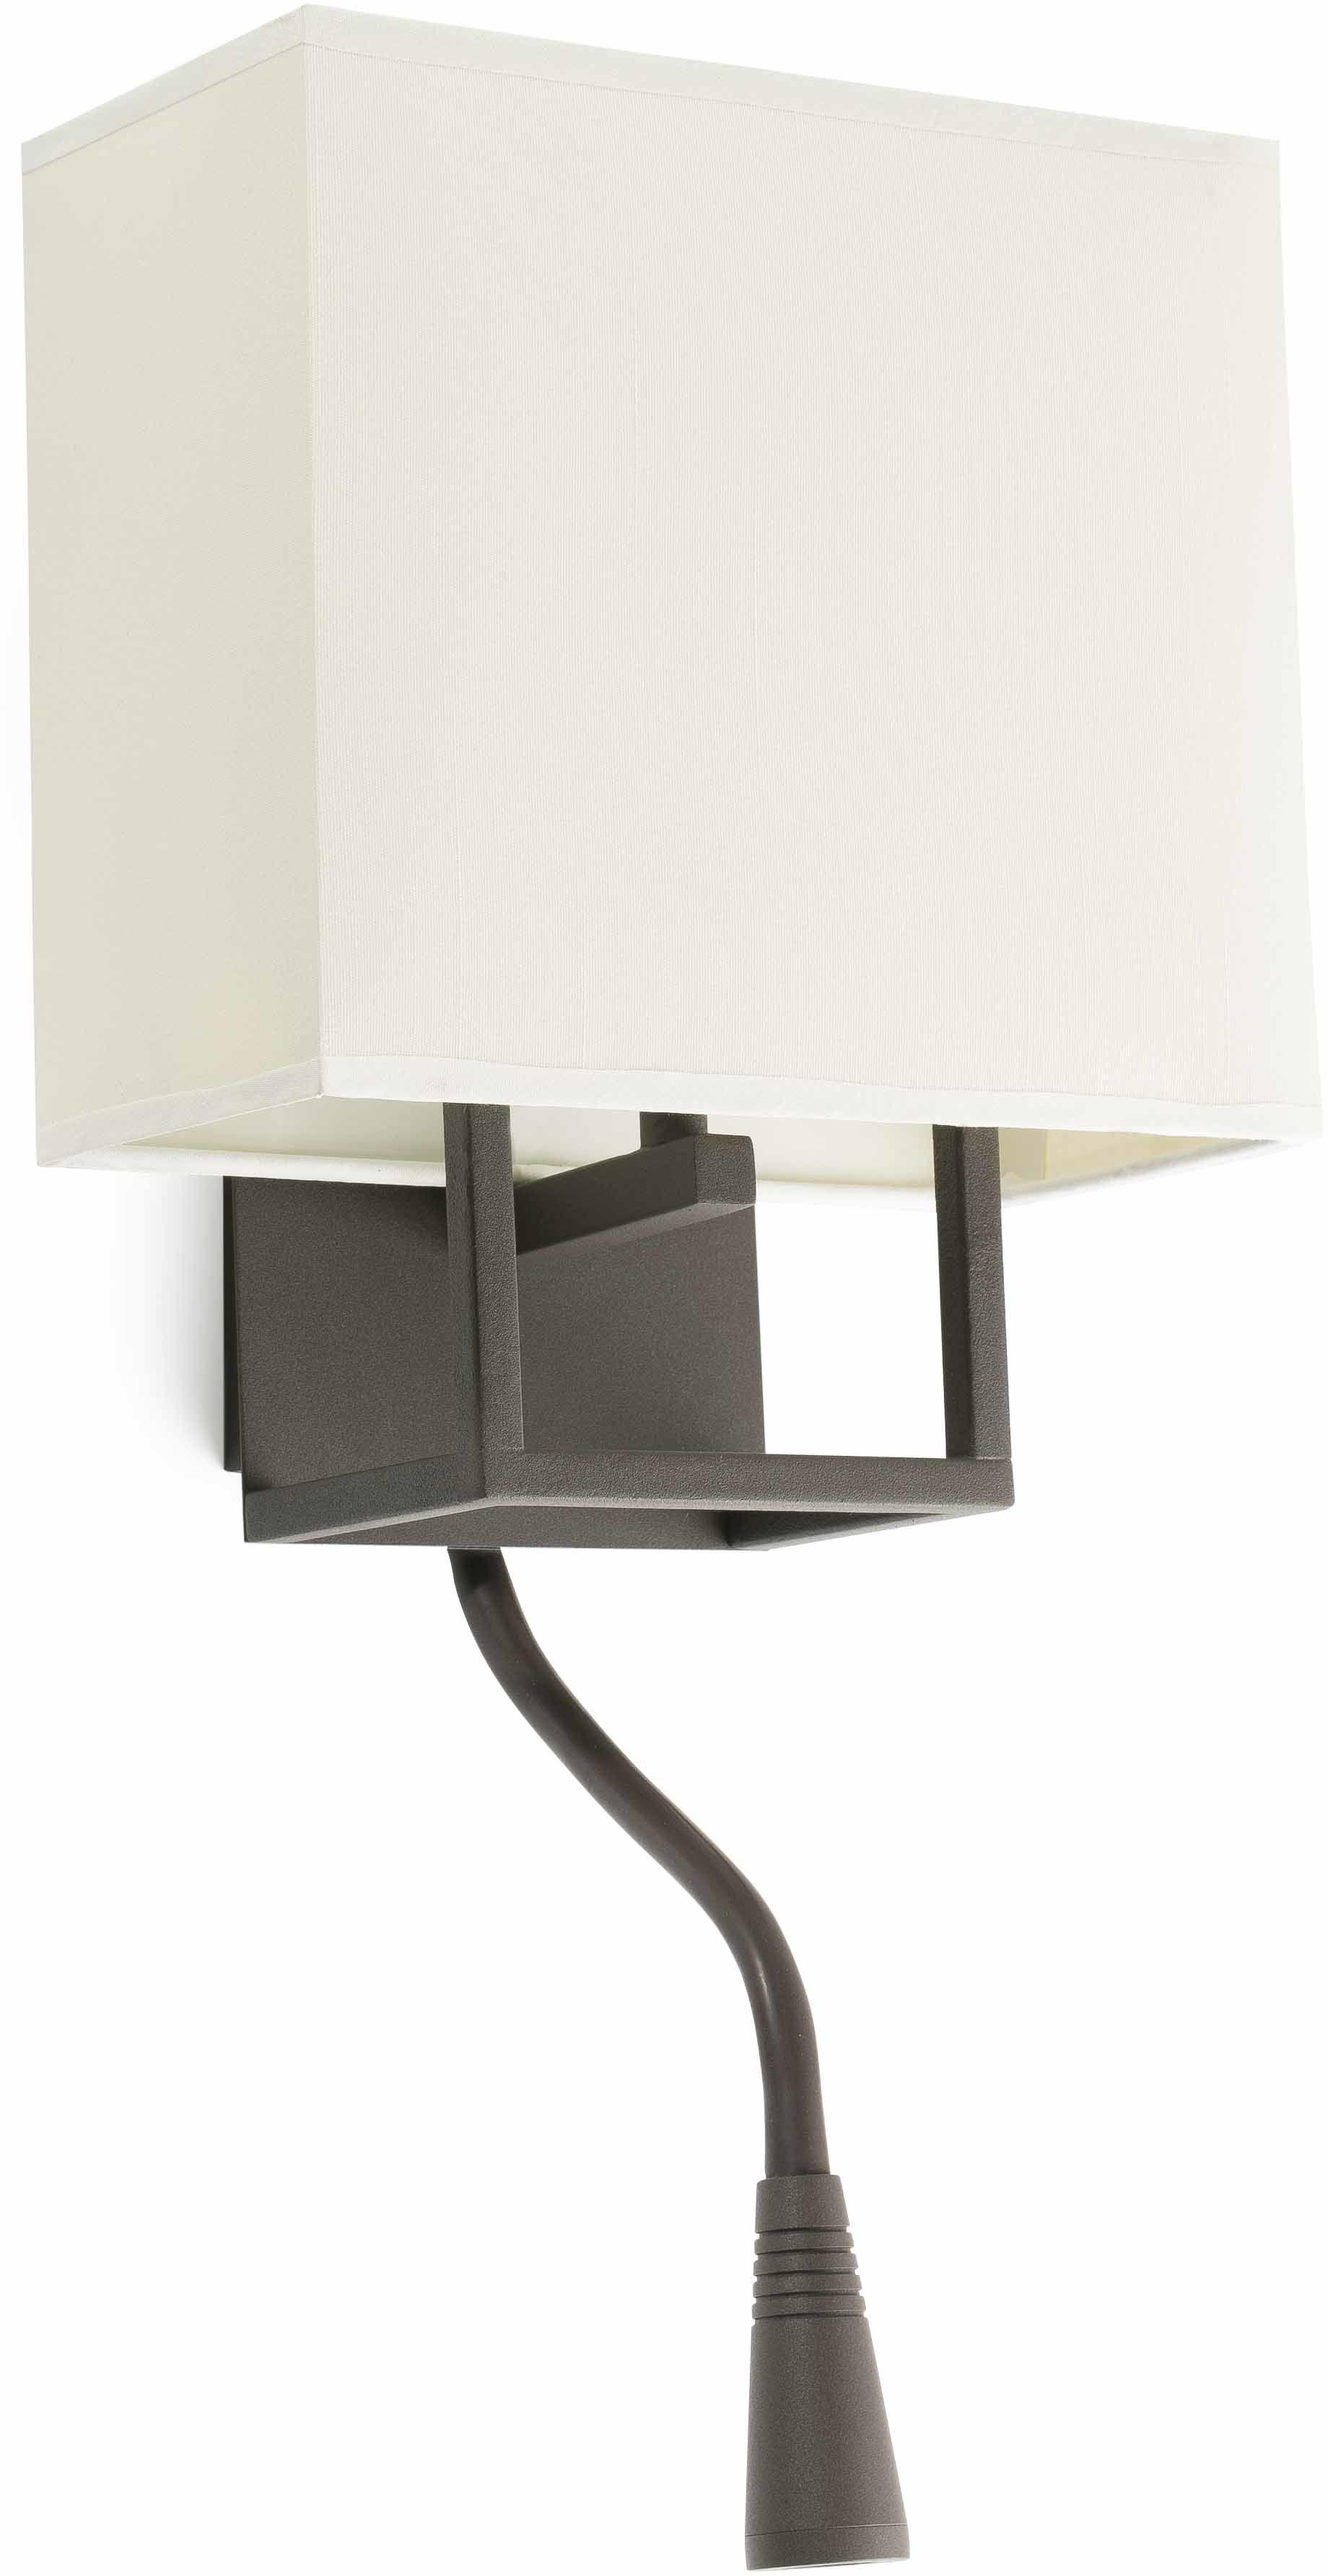 Vesper H45 brązowy - Faro - lampa ścienna